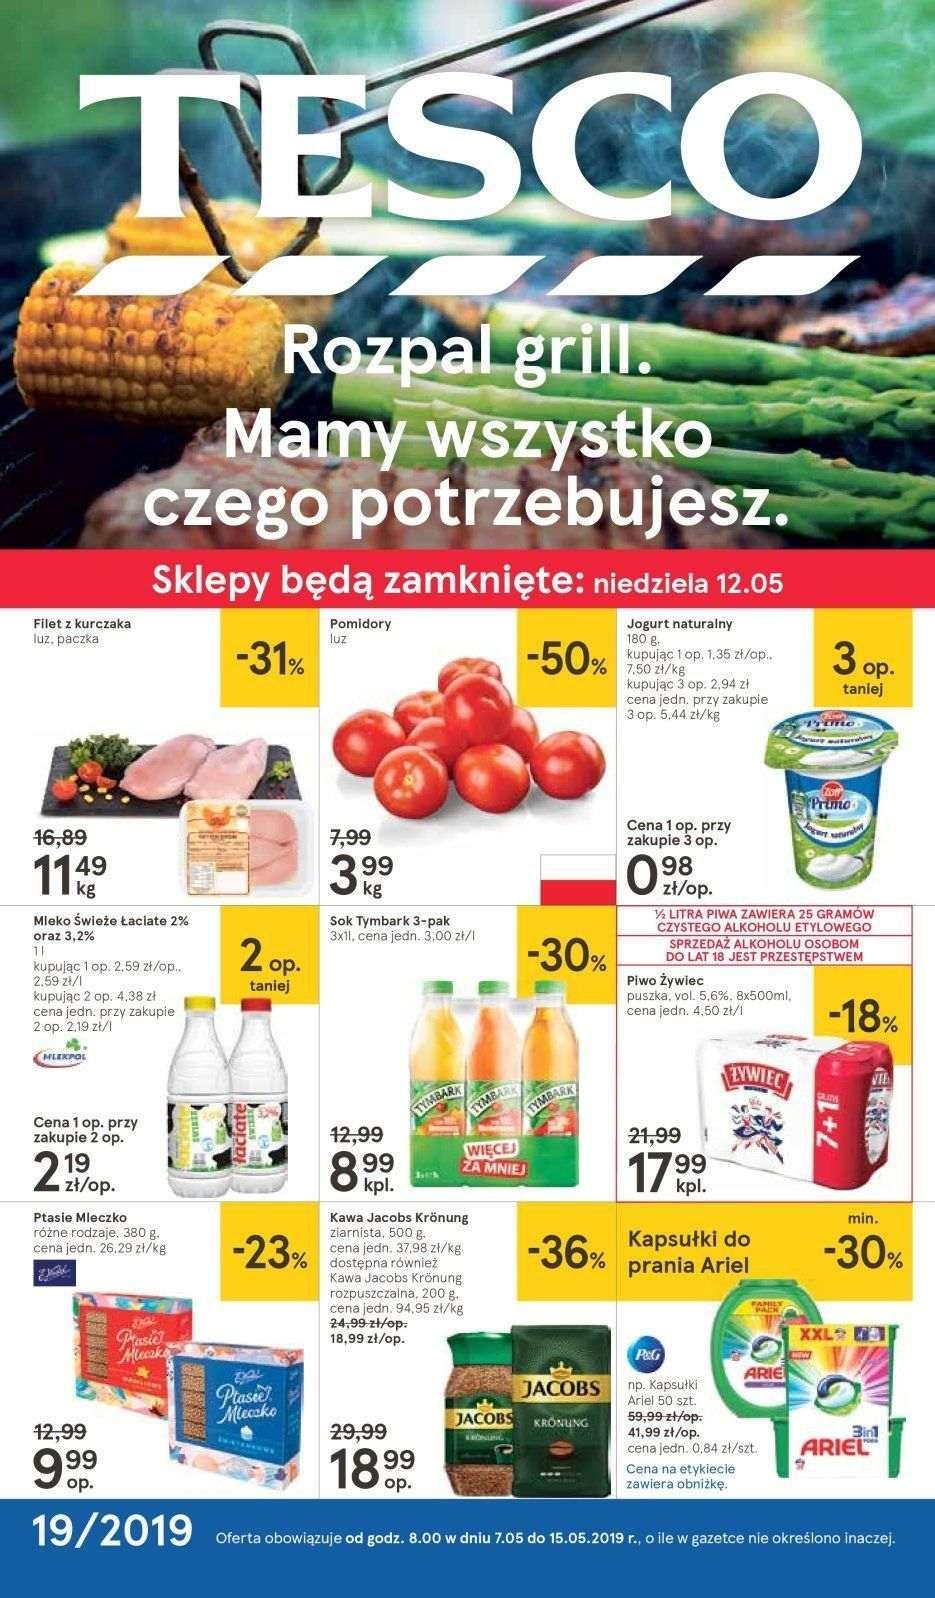 Gazetka promocyjna Tesco do 15/05/2019 str.1